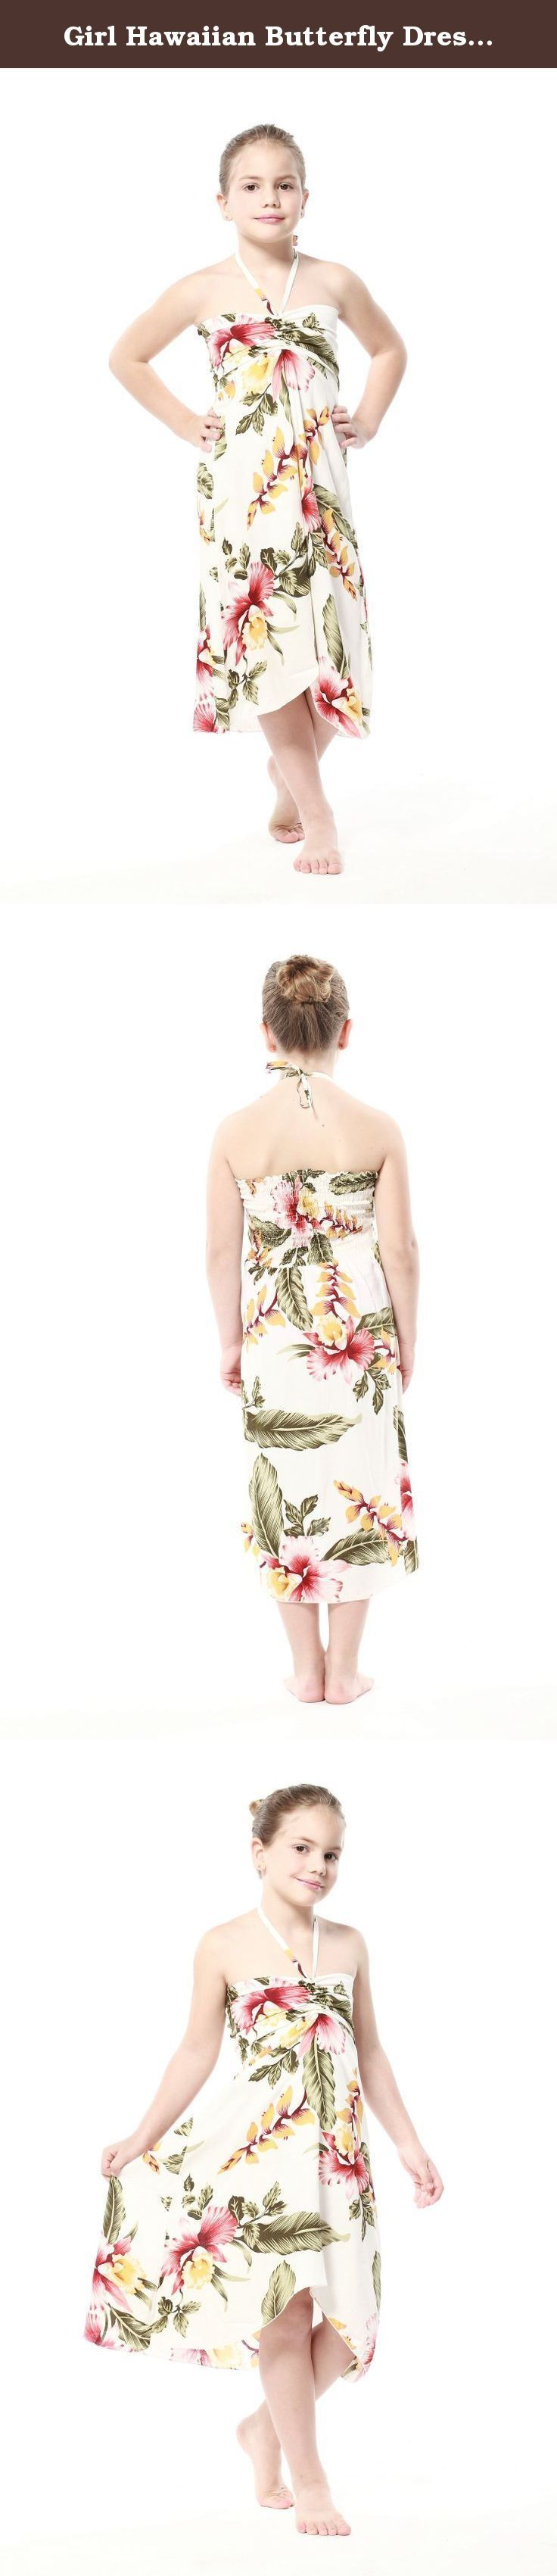 Girl Hawaiian Butterfly Dress in Cream Rafelsia Size 2. A beautiful Hawaiian print that is perfect for vacation, cruise, luau or Hawaiian themed party or wedding celebration.